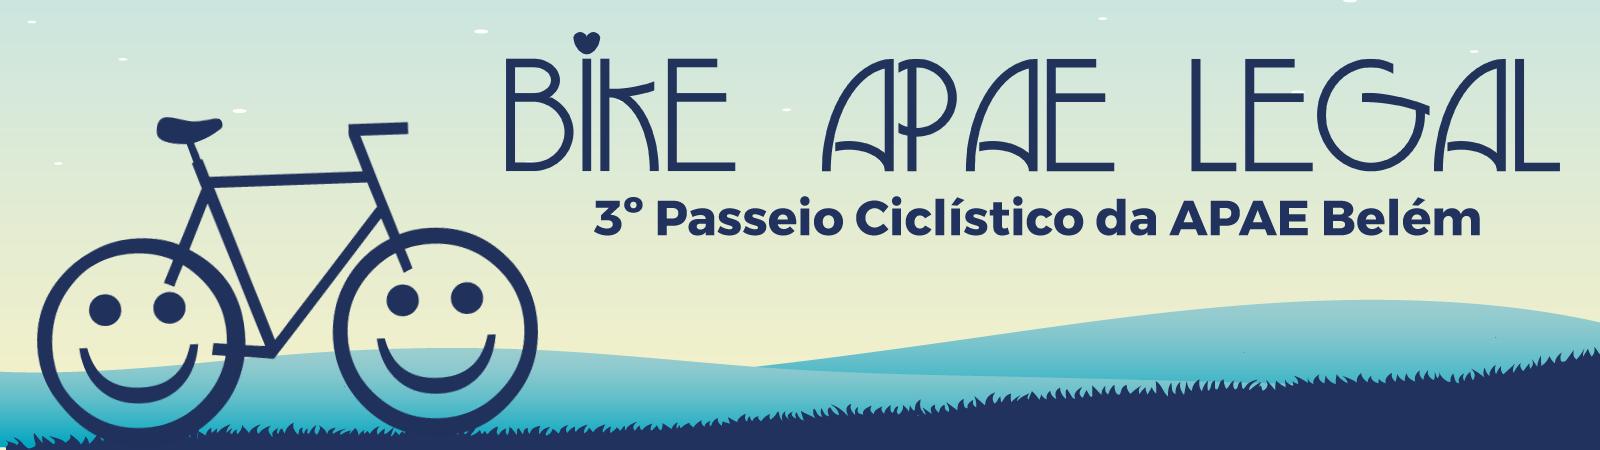 3º PASSEIO CICLÍSTICO BIKE APAE LEGAL